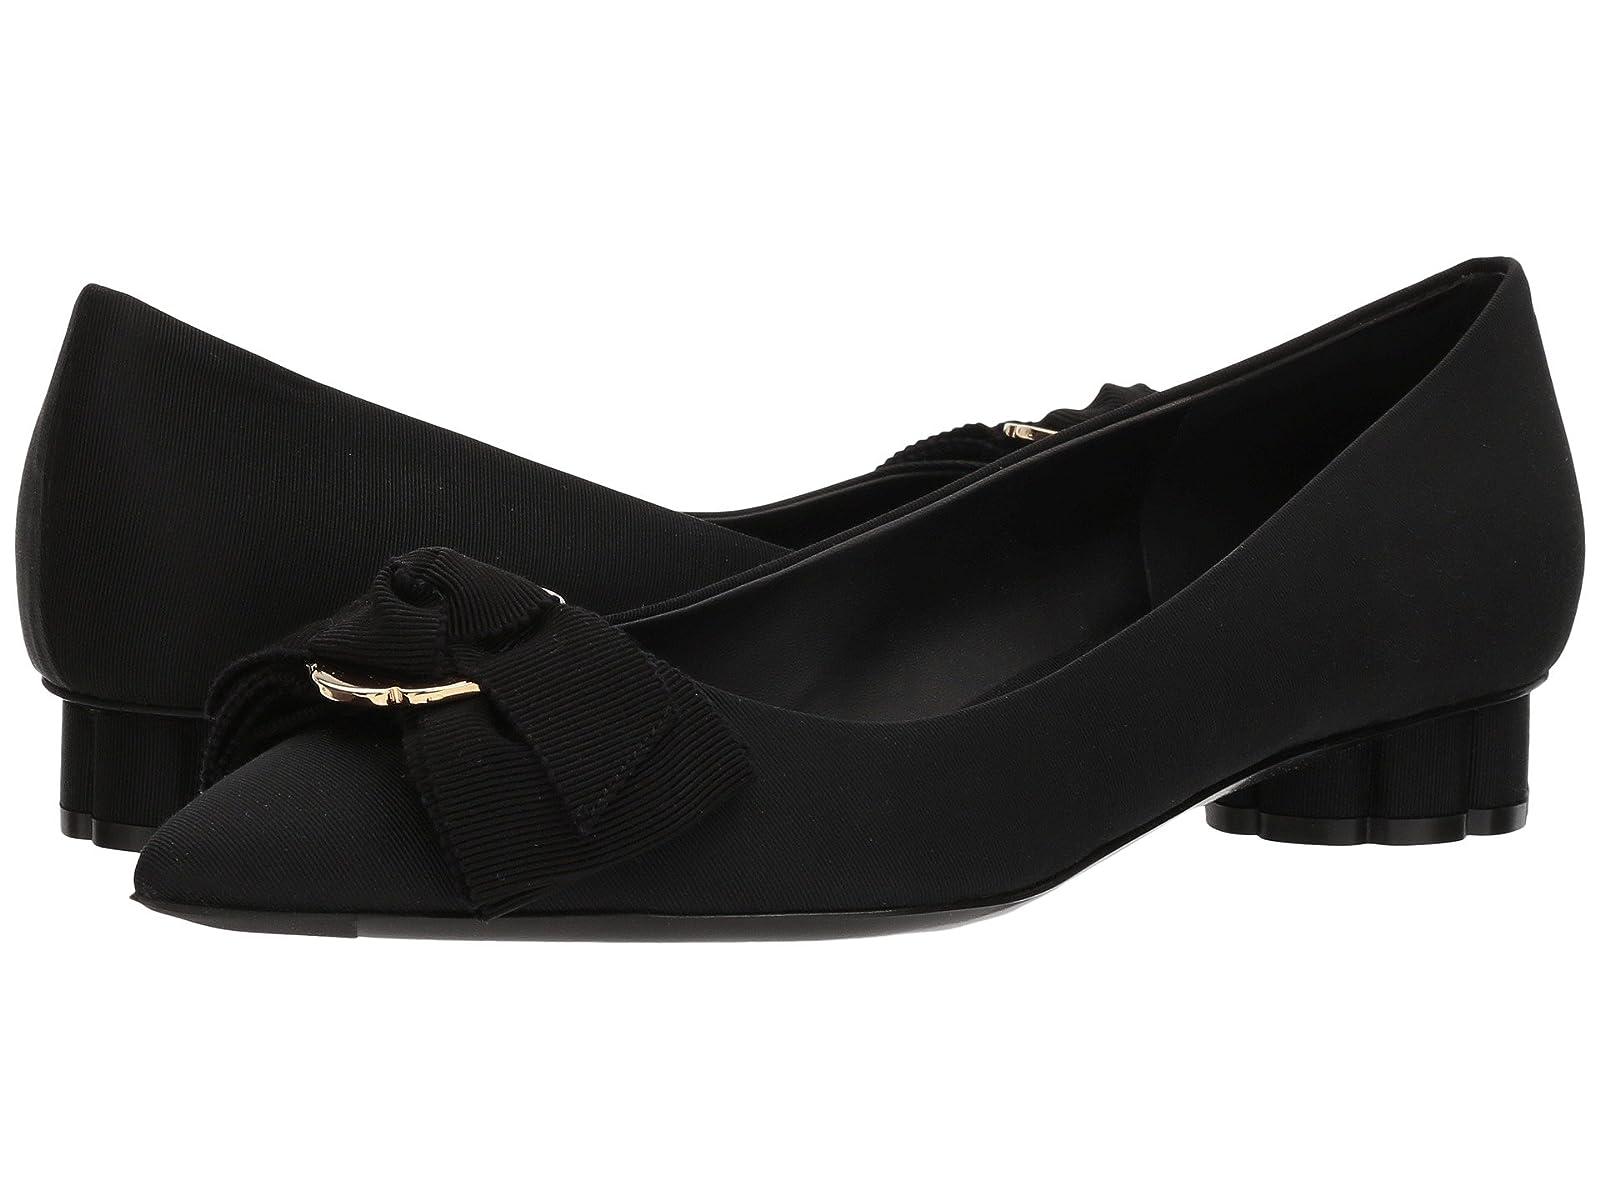 Salvatore Ferragamo Talla 20Cheap and distinctive eye-catching shoes